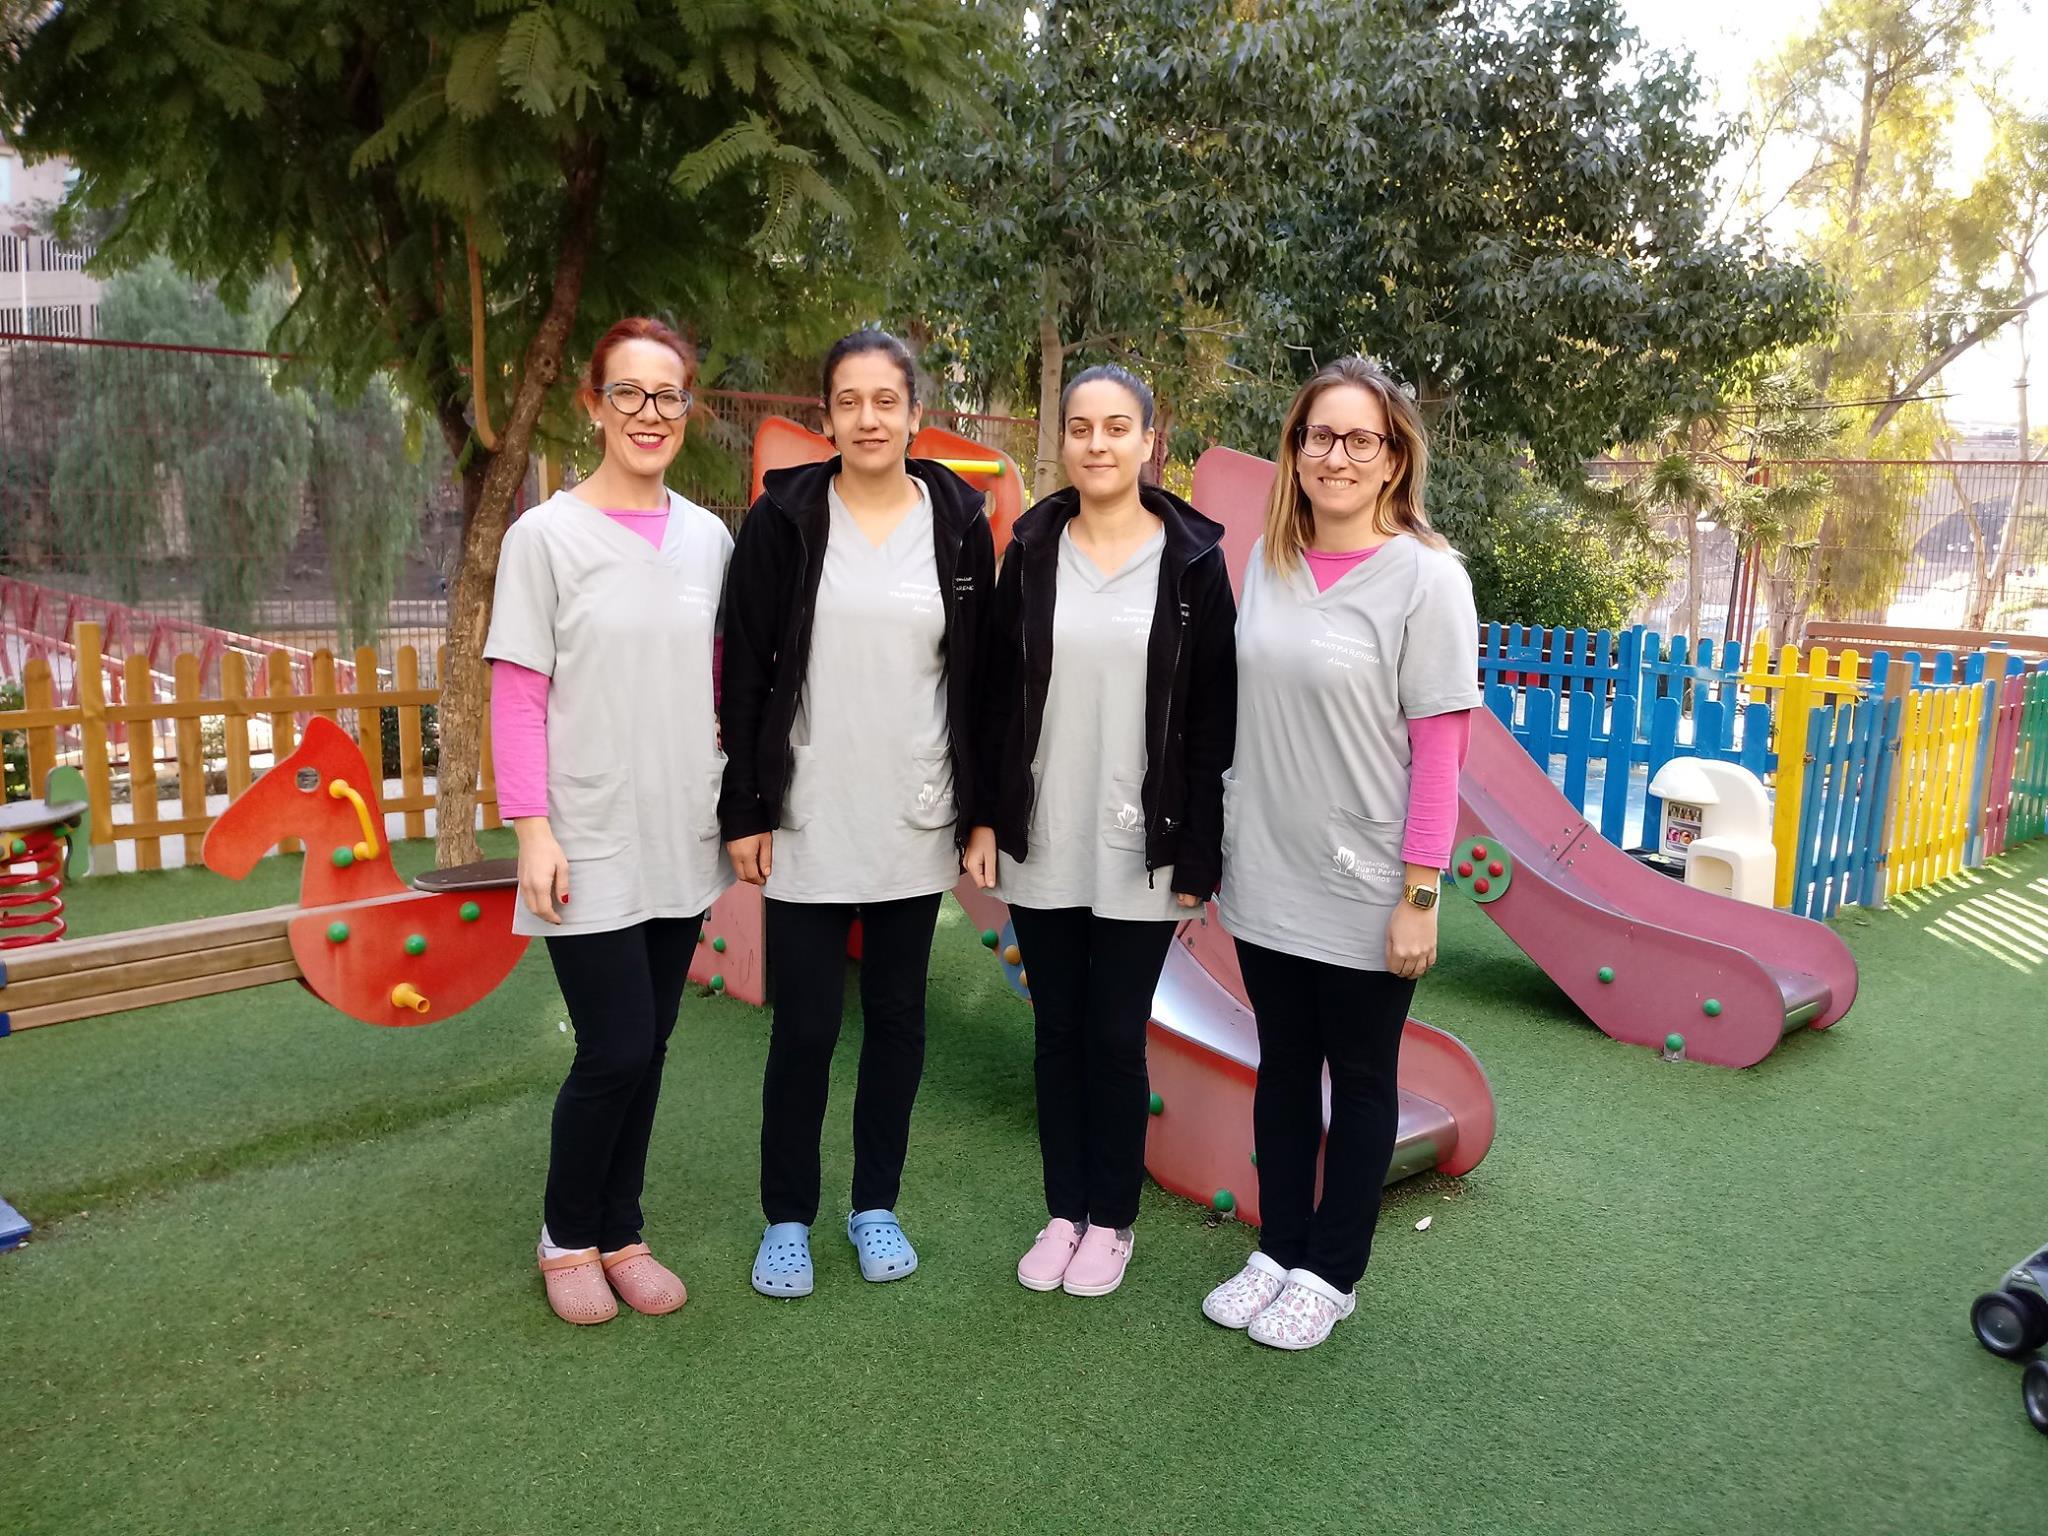 uniforme-salud-infantil-fundacio-pikolinos-a-puntadas